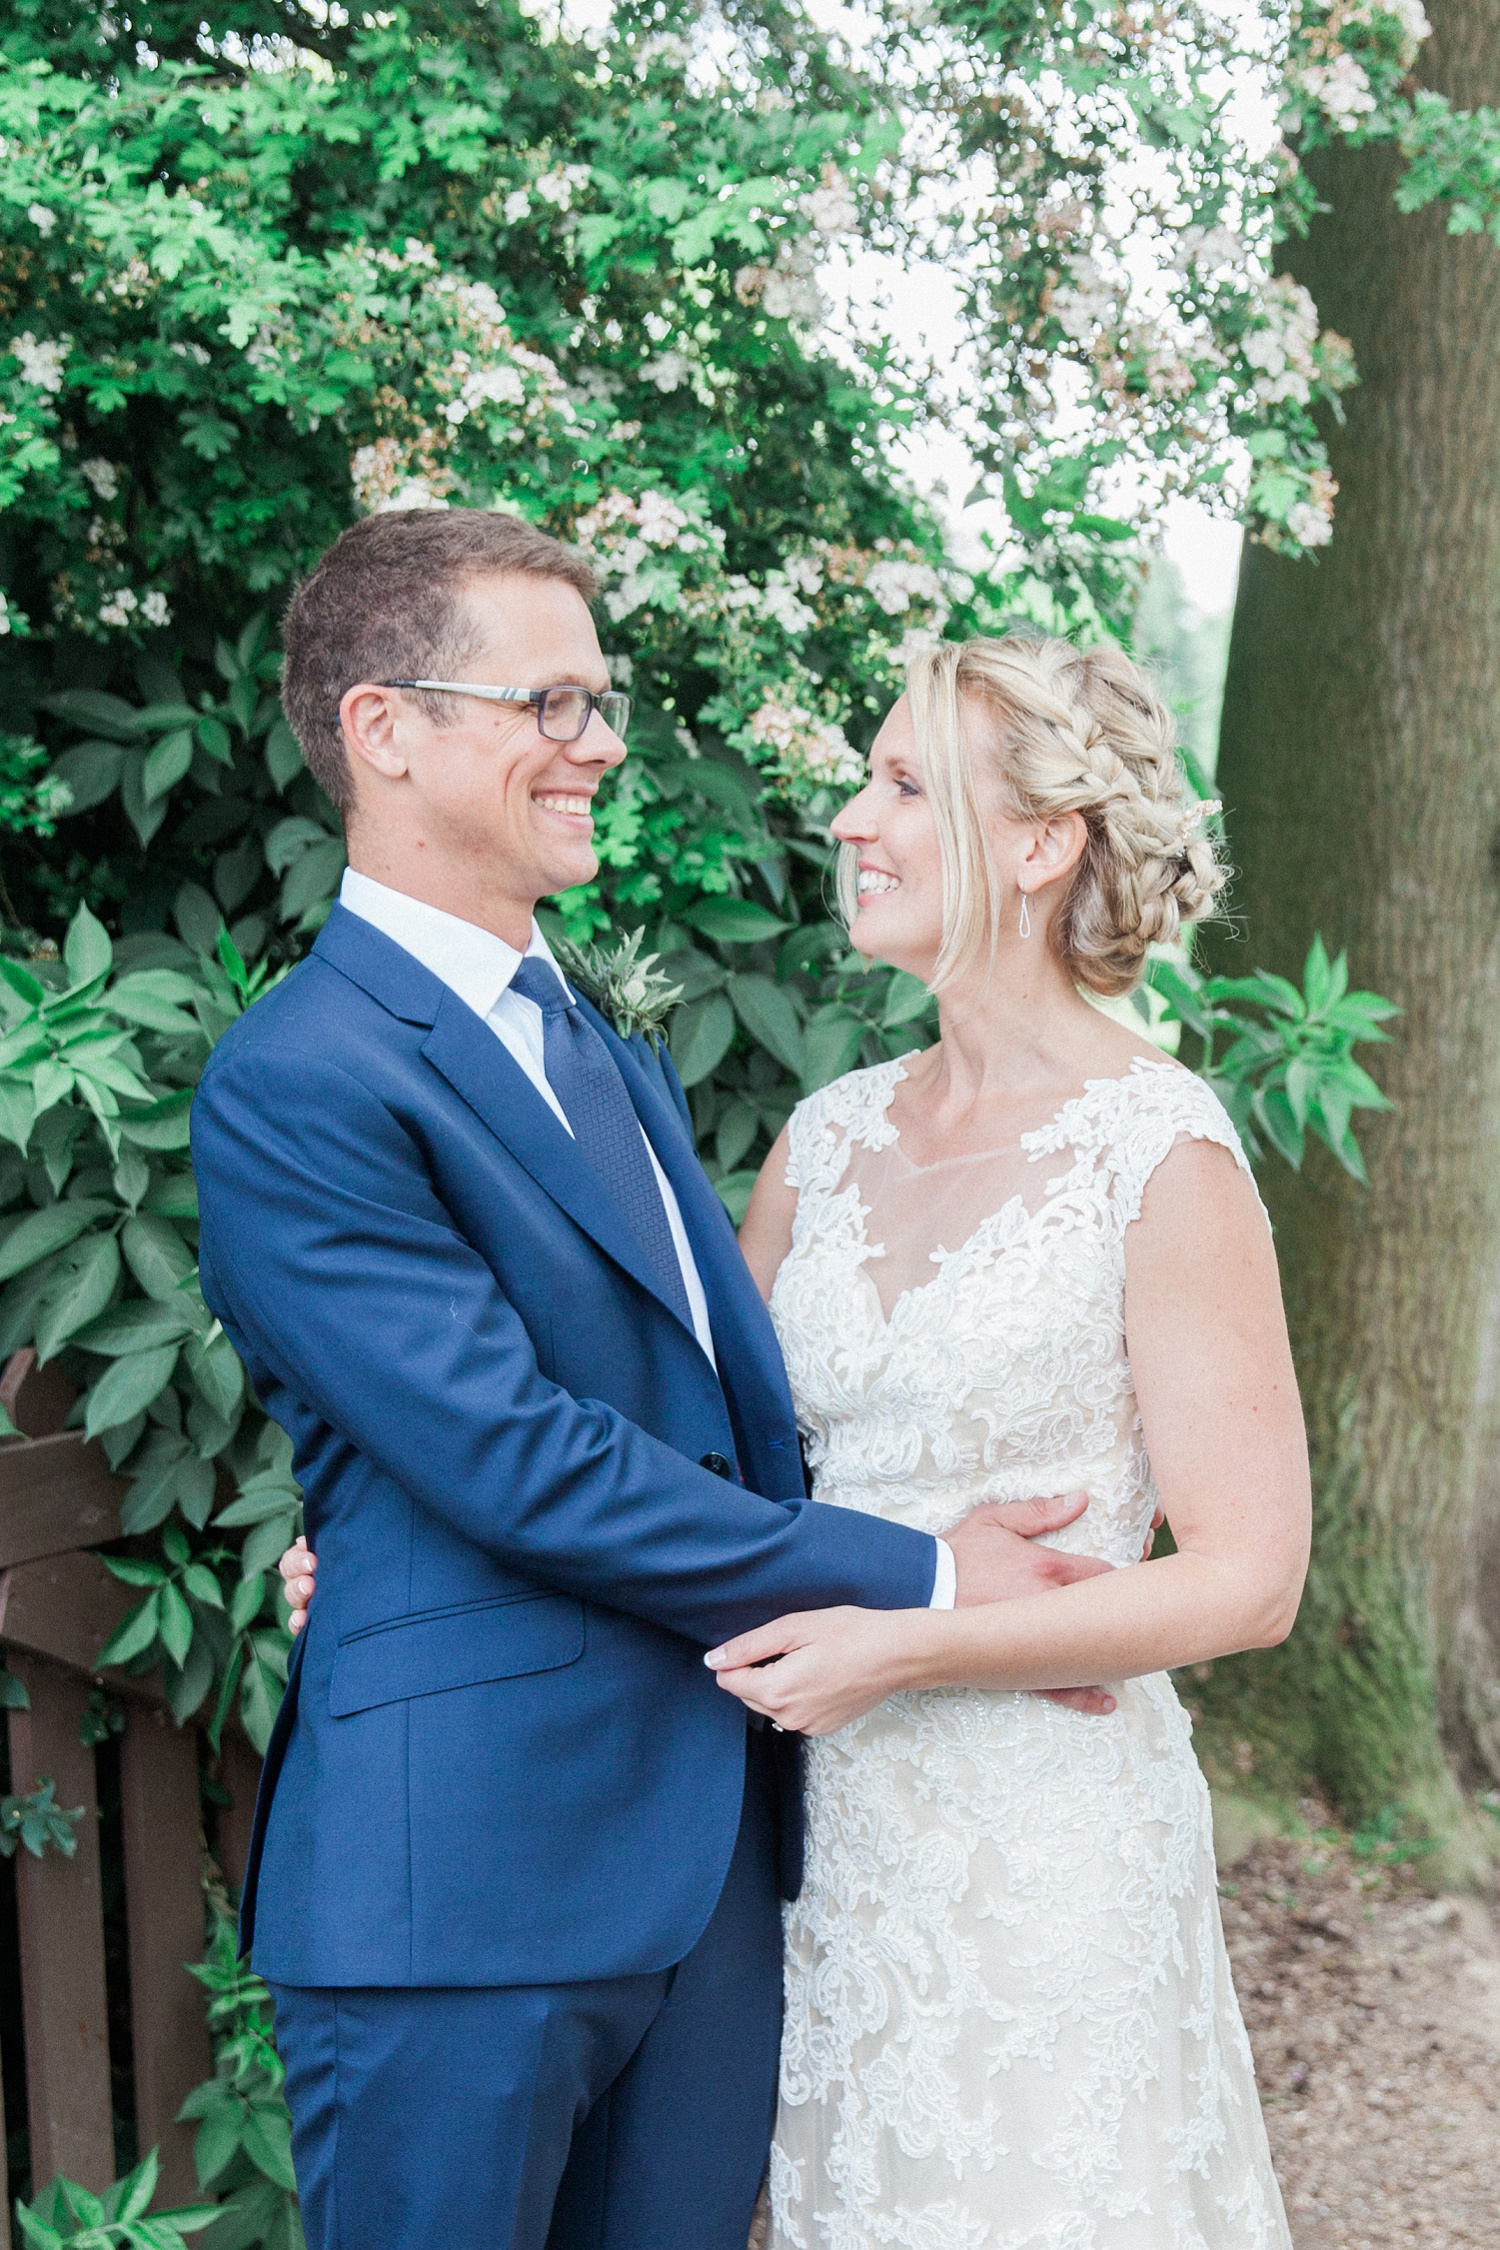 London wedding photographer at Belair House